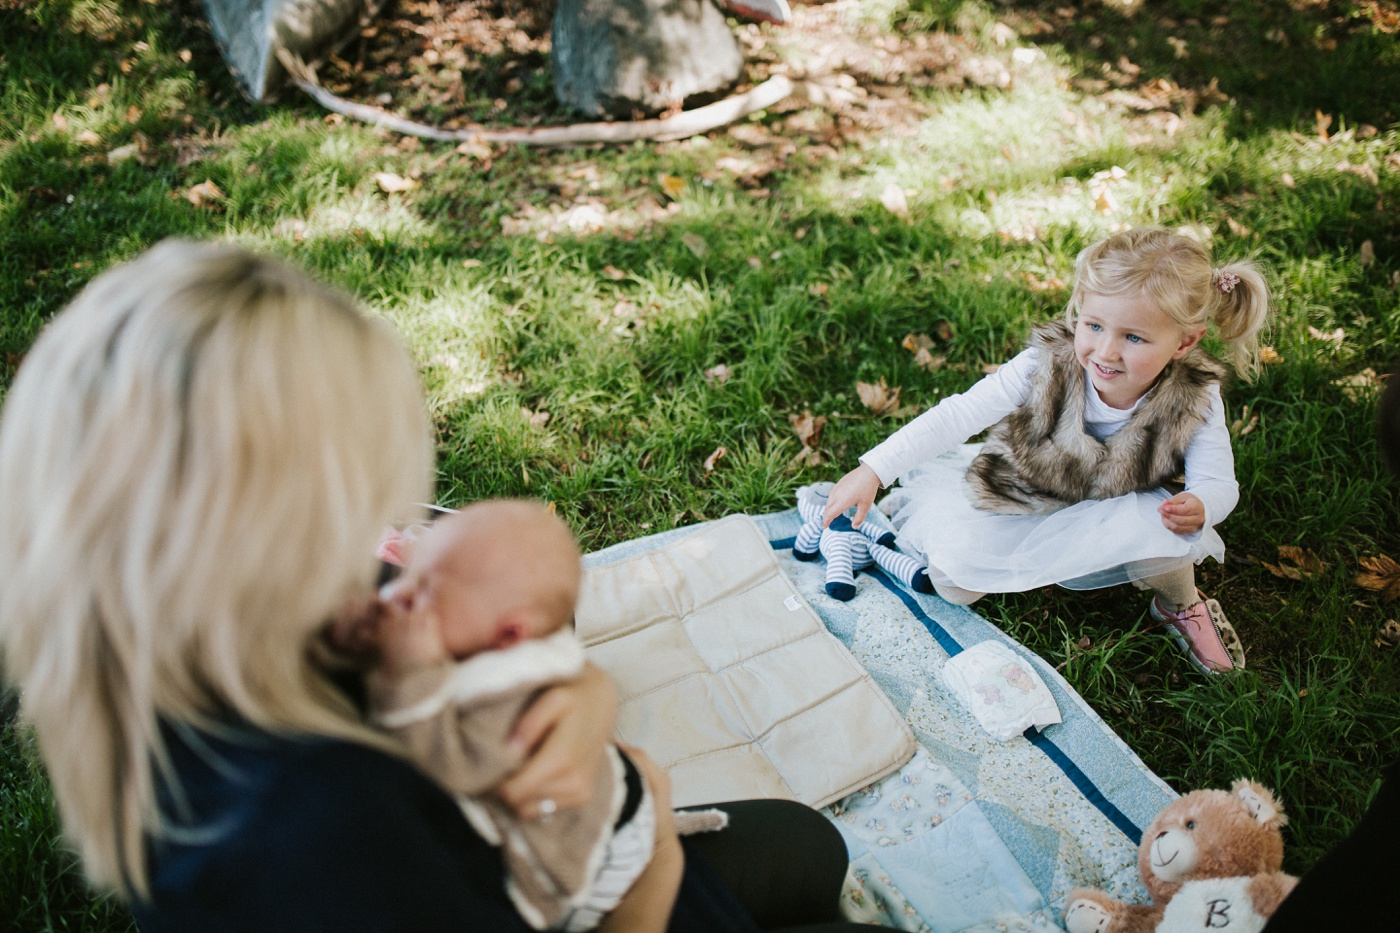 Blake-Lily-Rolig-Lekfull-Familjesession-Familjefotograf-Stockholm-Orebro_06